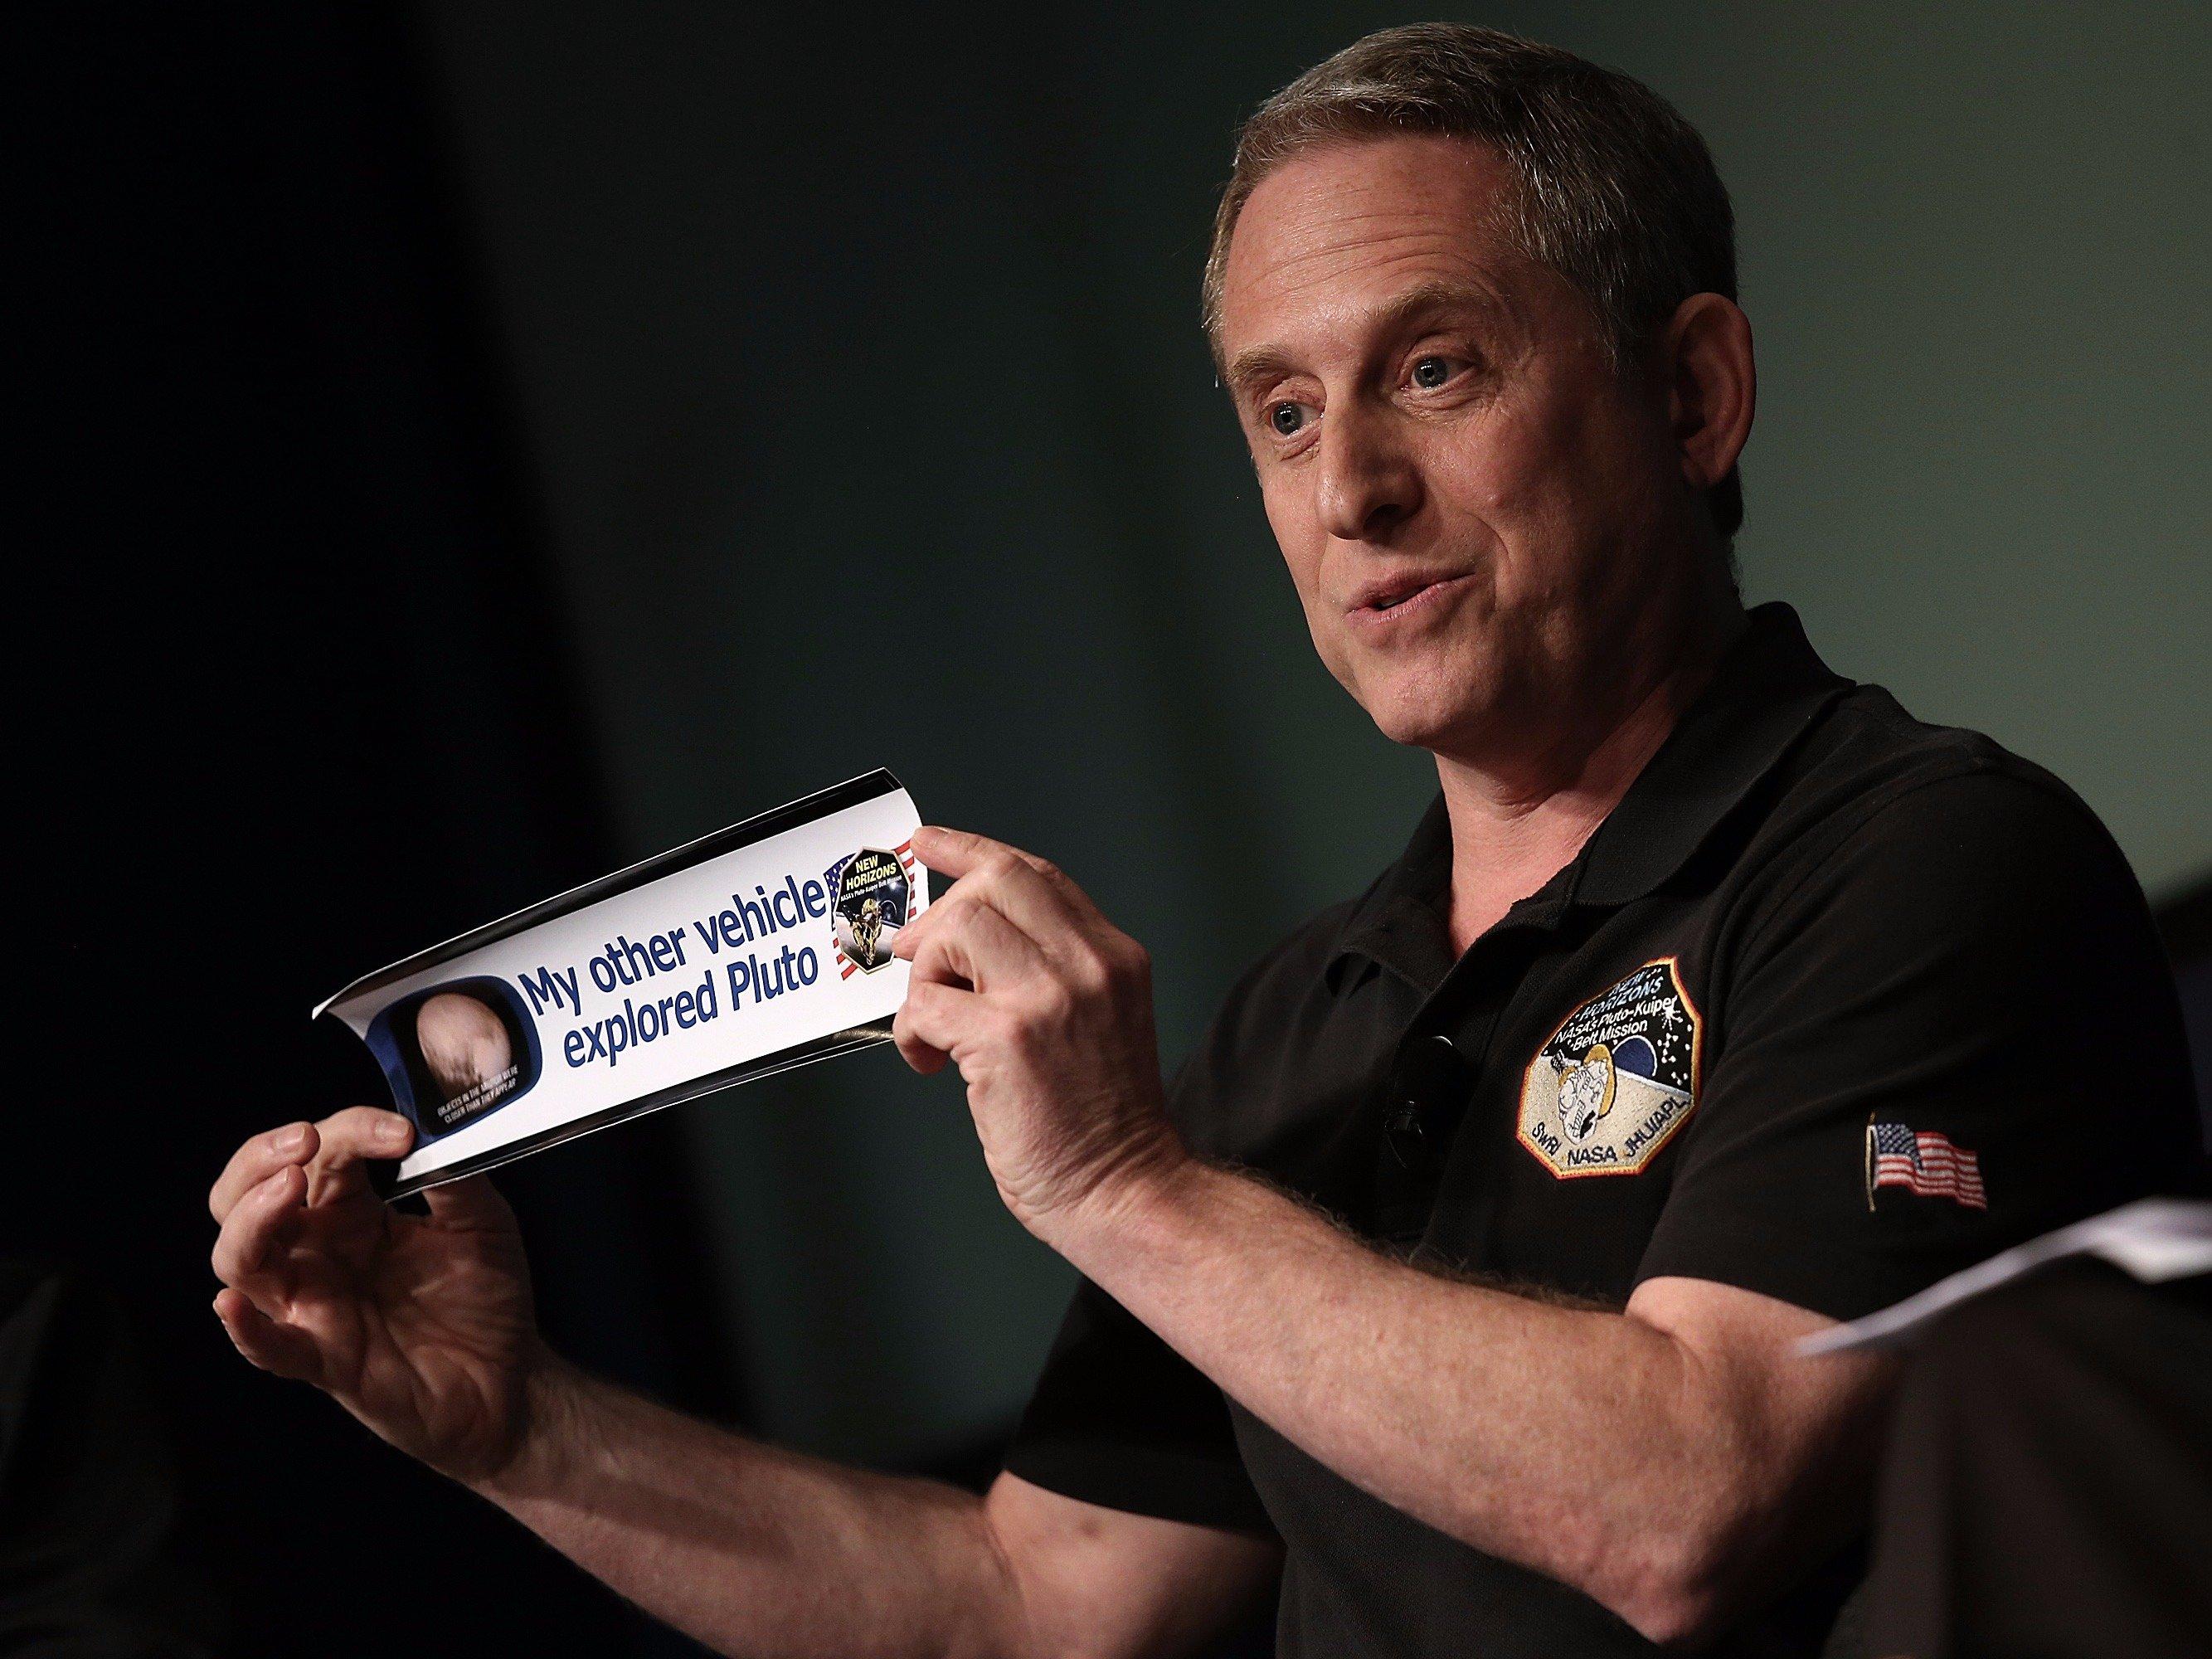 Alan Stern. Credit: NASA